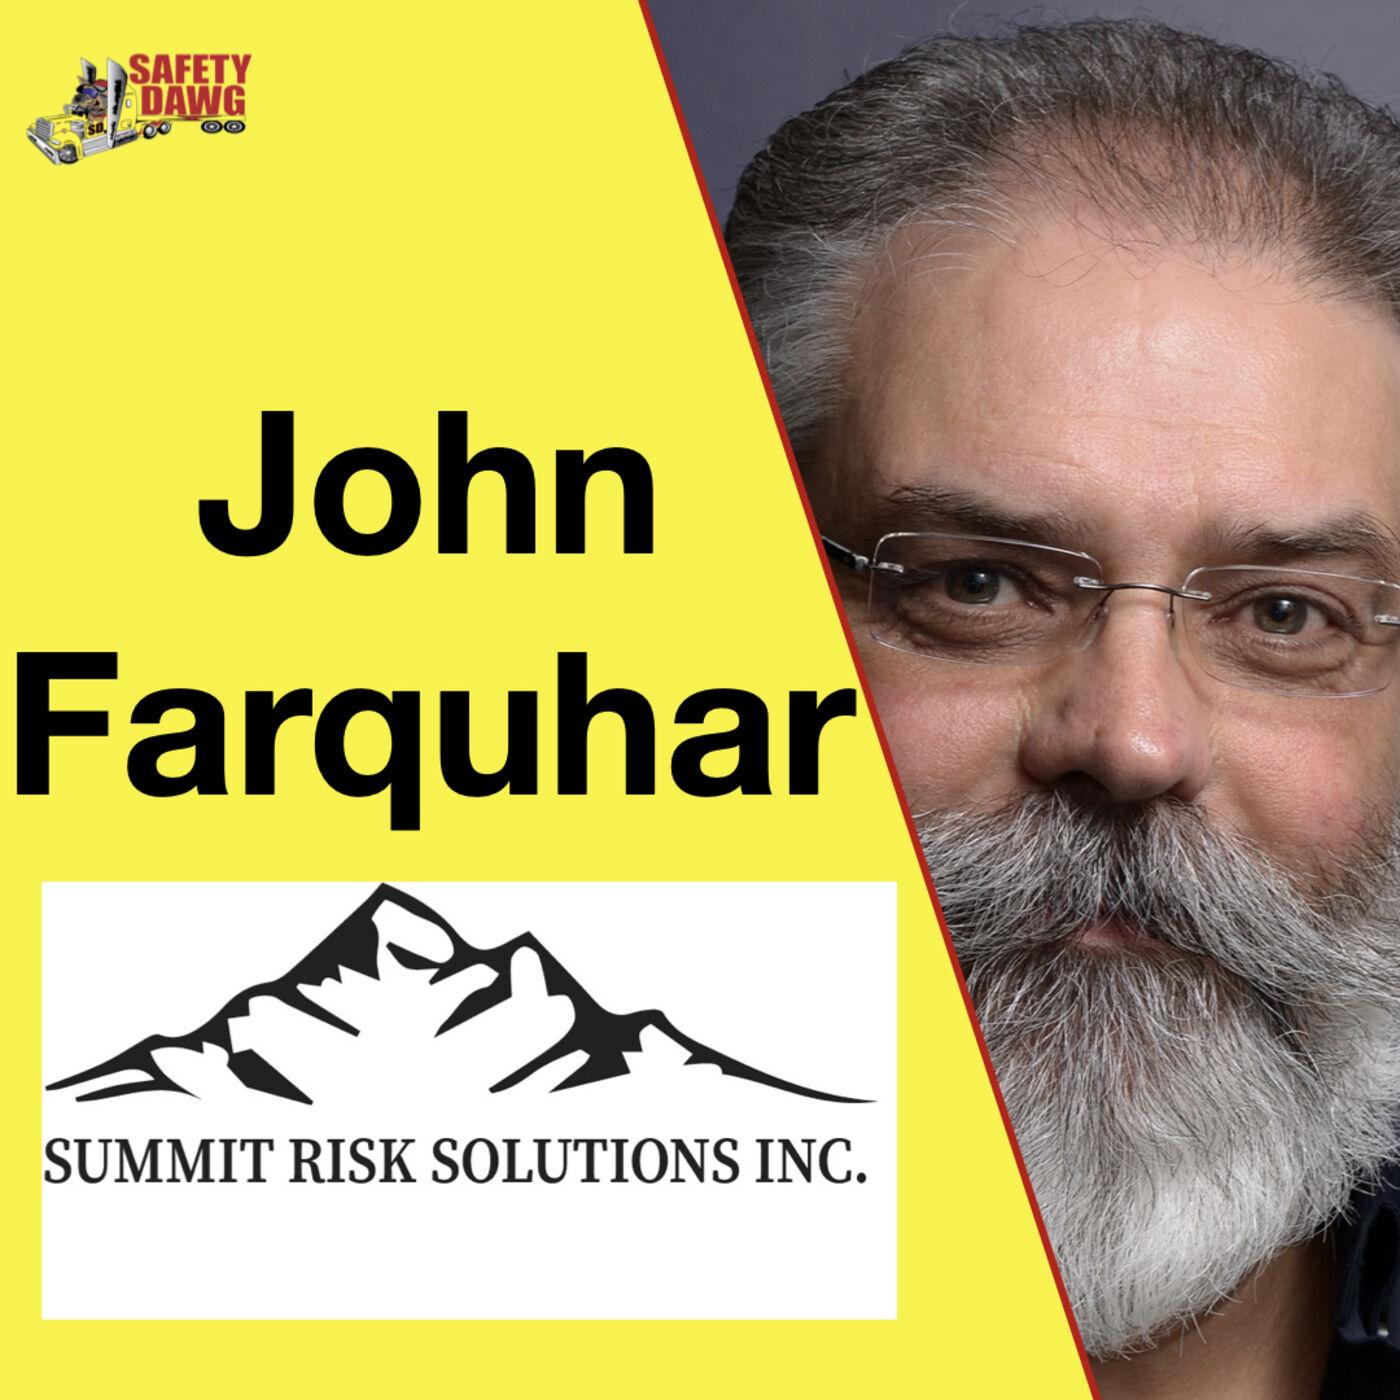 27. Bills Of Lading and Your Hidden Landmines, John Farquhar, Summit Risk Solutions